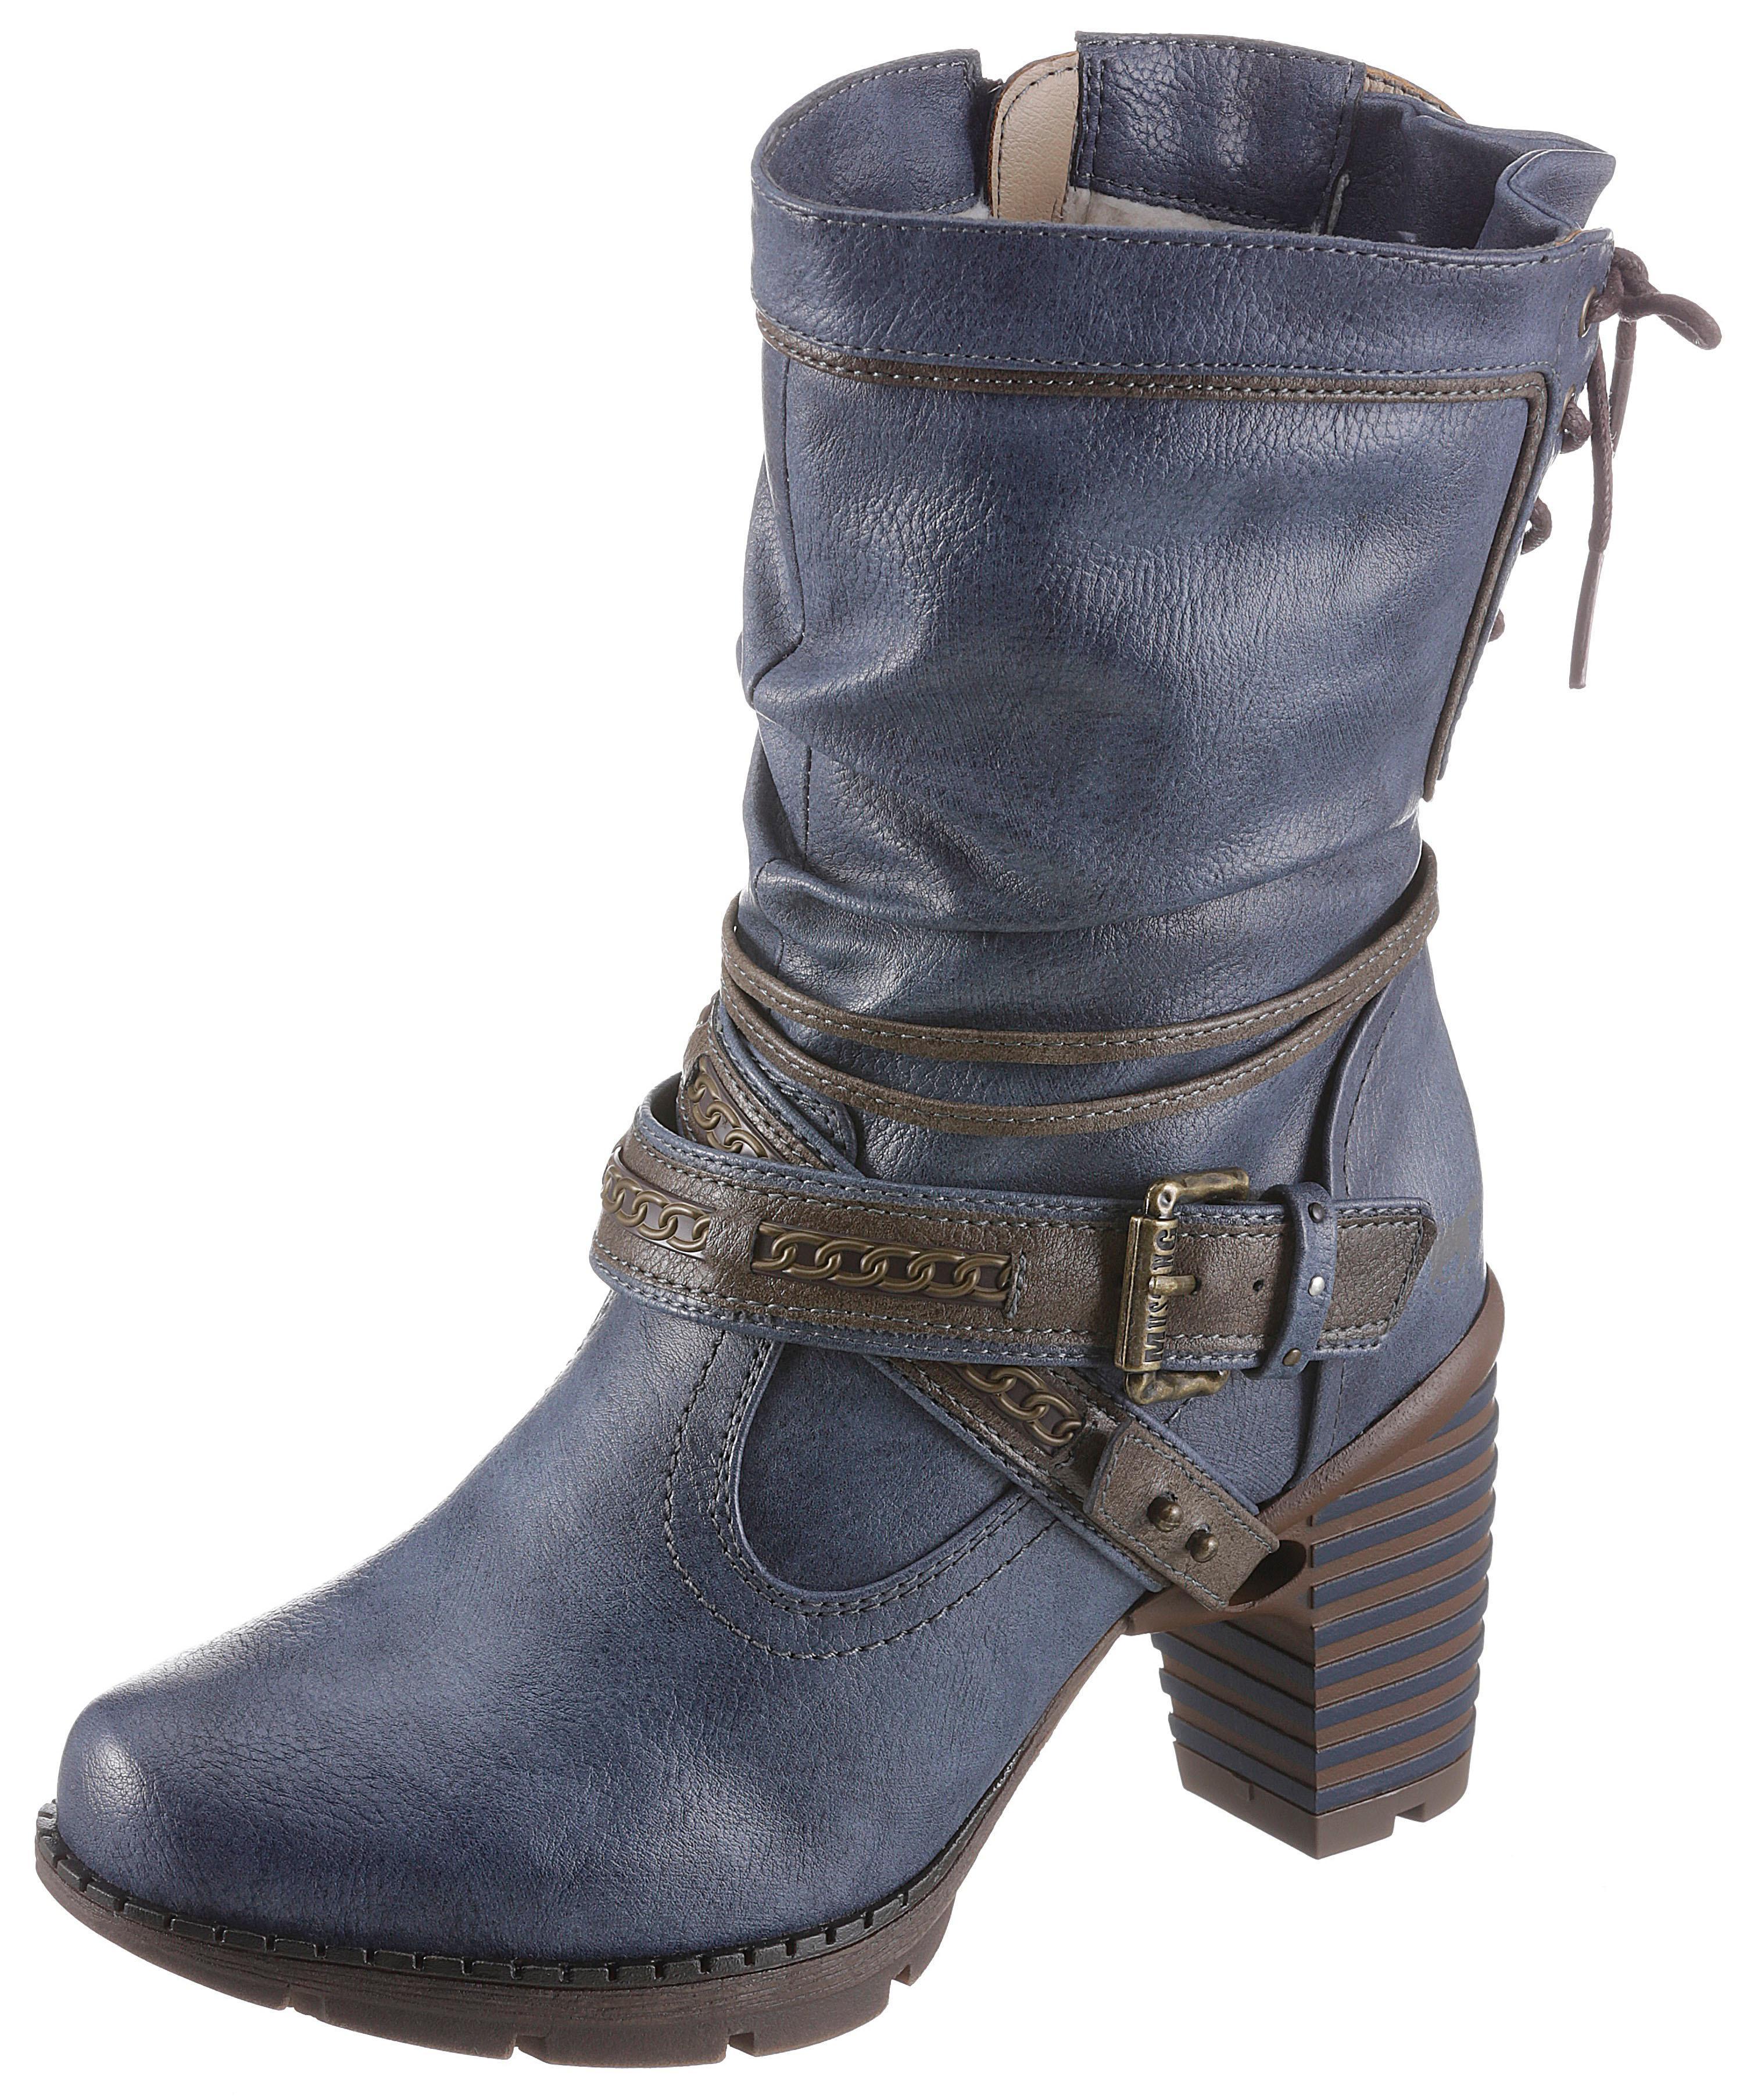 sale retailer f7a51 72940 Mustang Shoes Winterstiefel